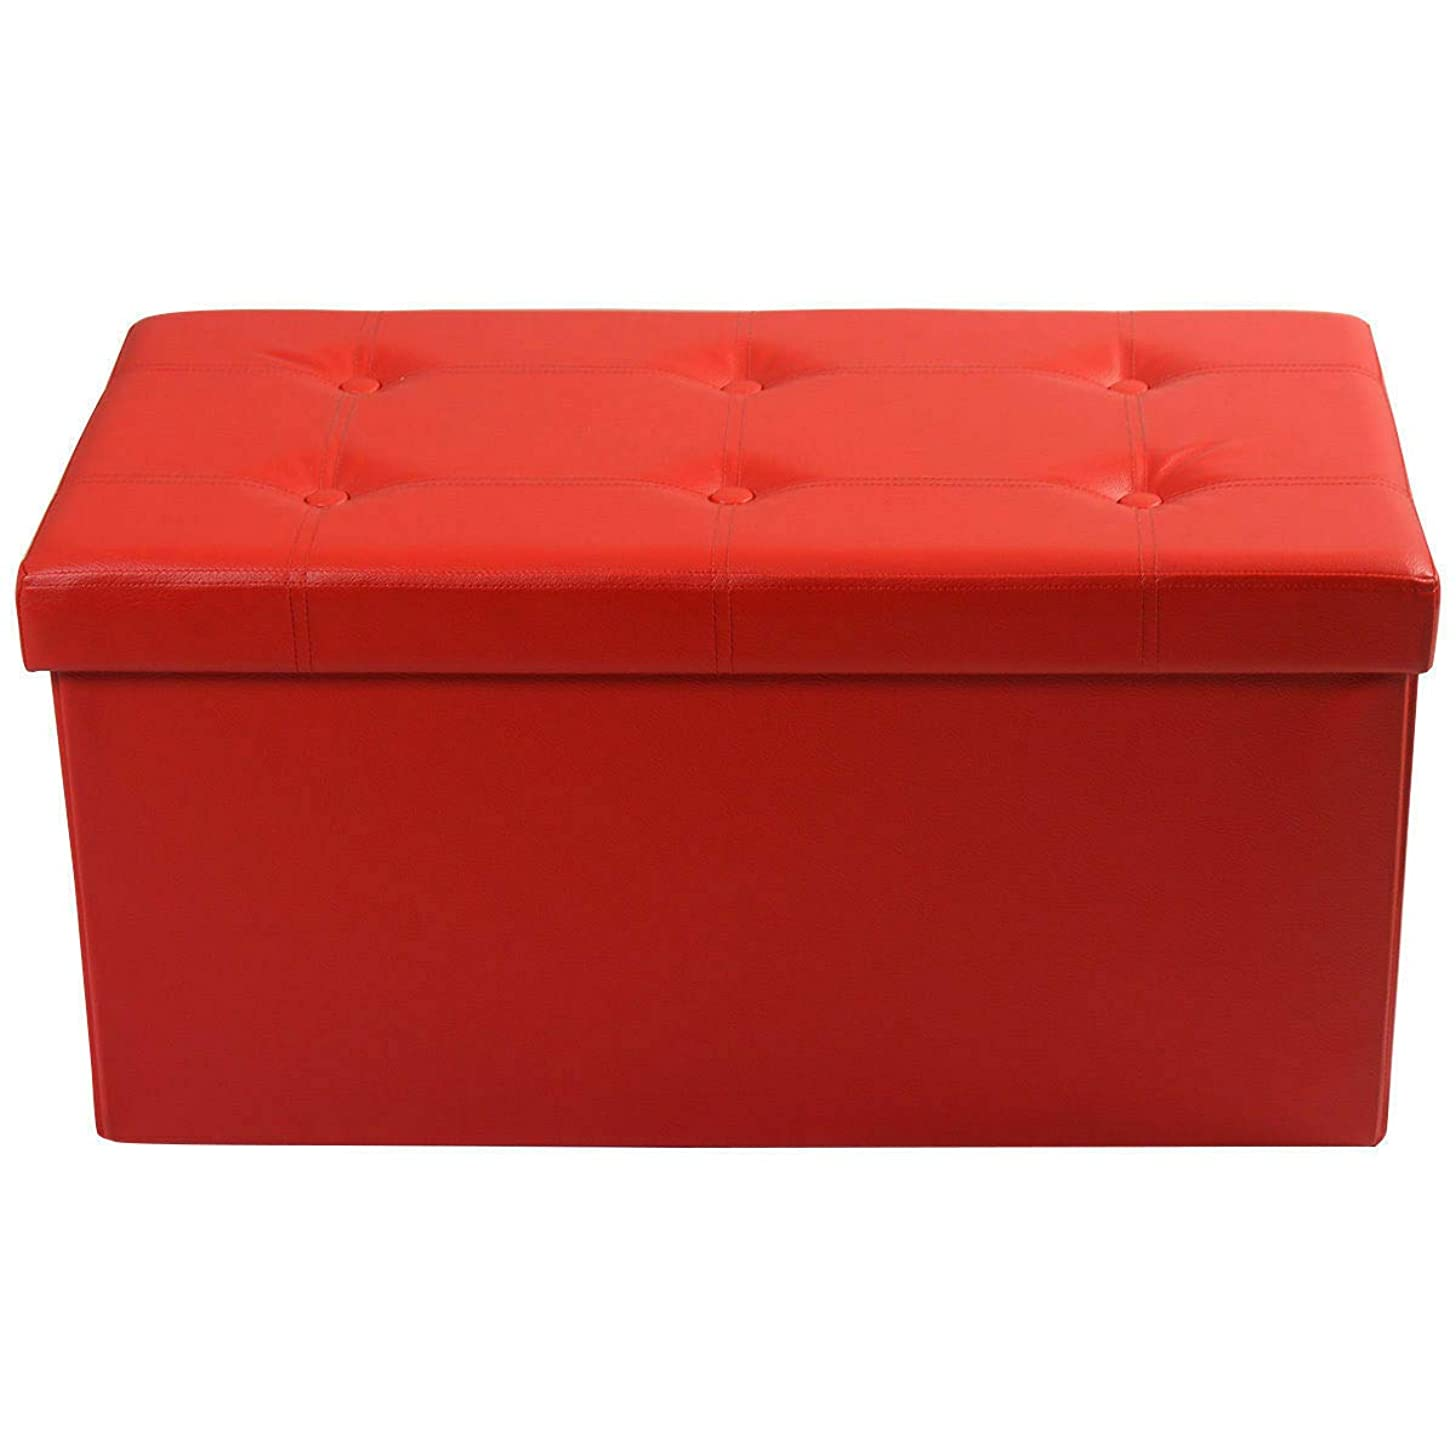 Red Large Folding Storage Ottoman Pouffe Faux Leather Box Stool Case Relax Seat Bench Footstool w/Storage(U.S. Stock)